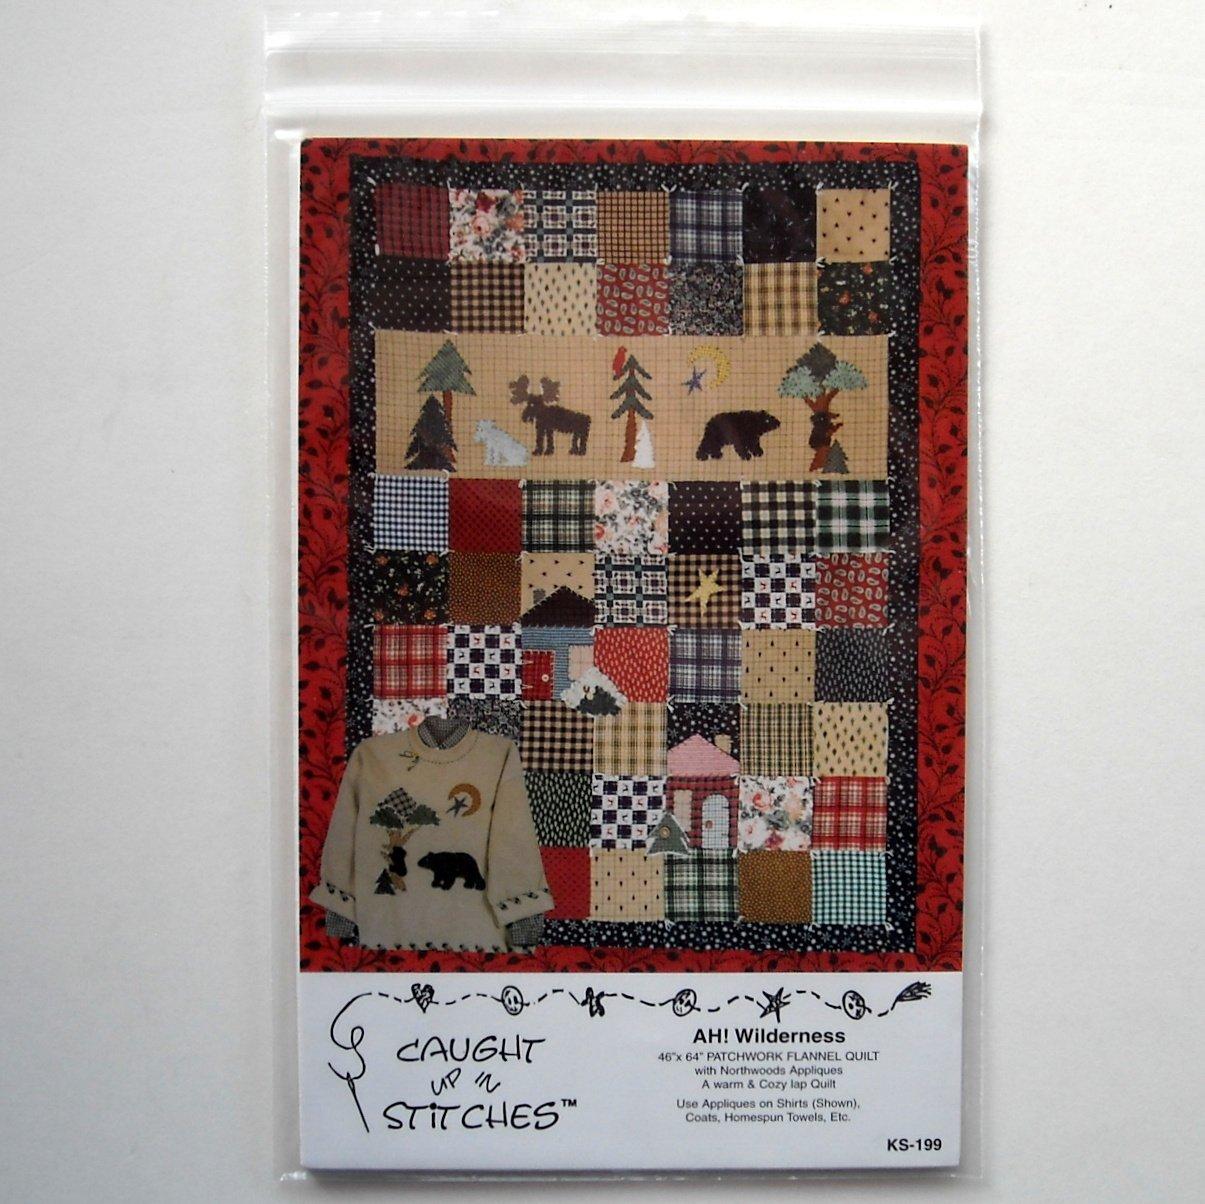 Caught Up In Stitches 1997 AH Wilderness Crafts Pattern # KS-199